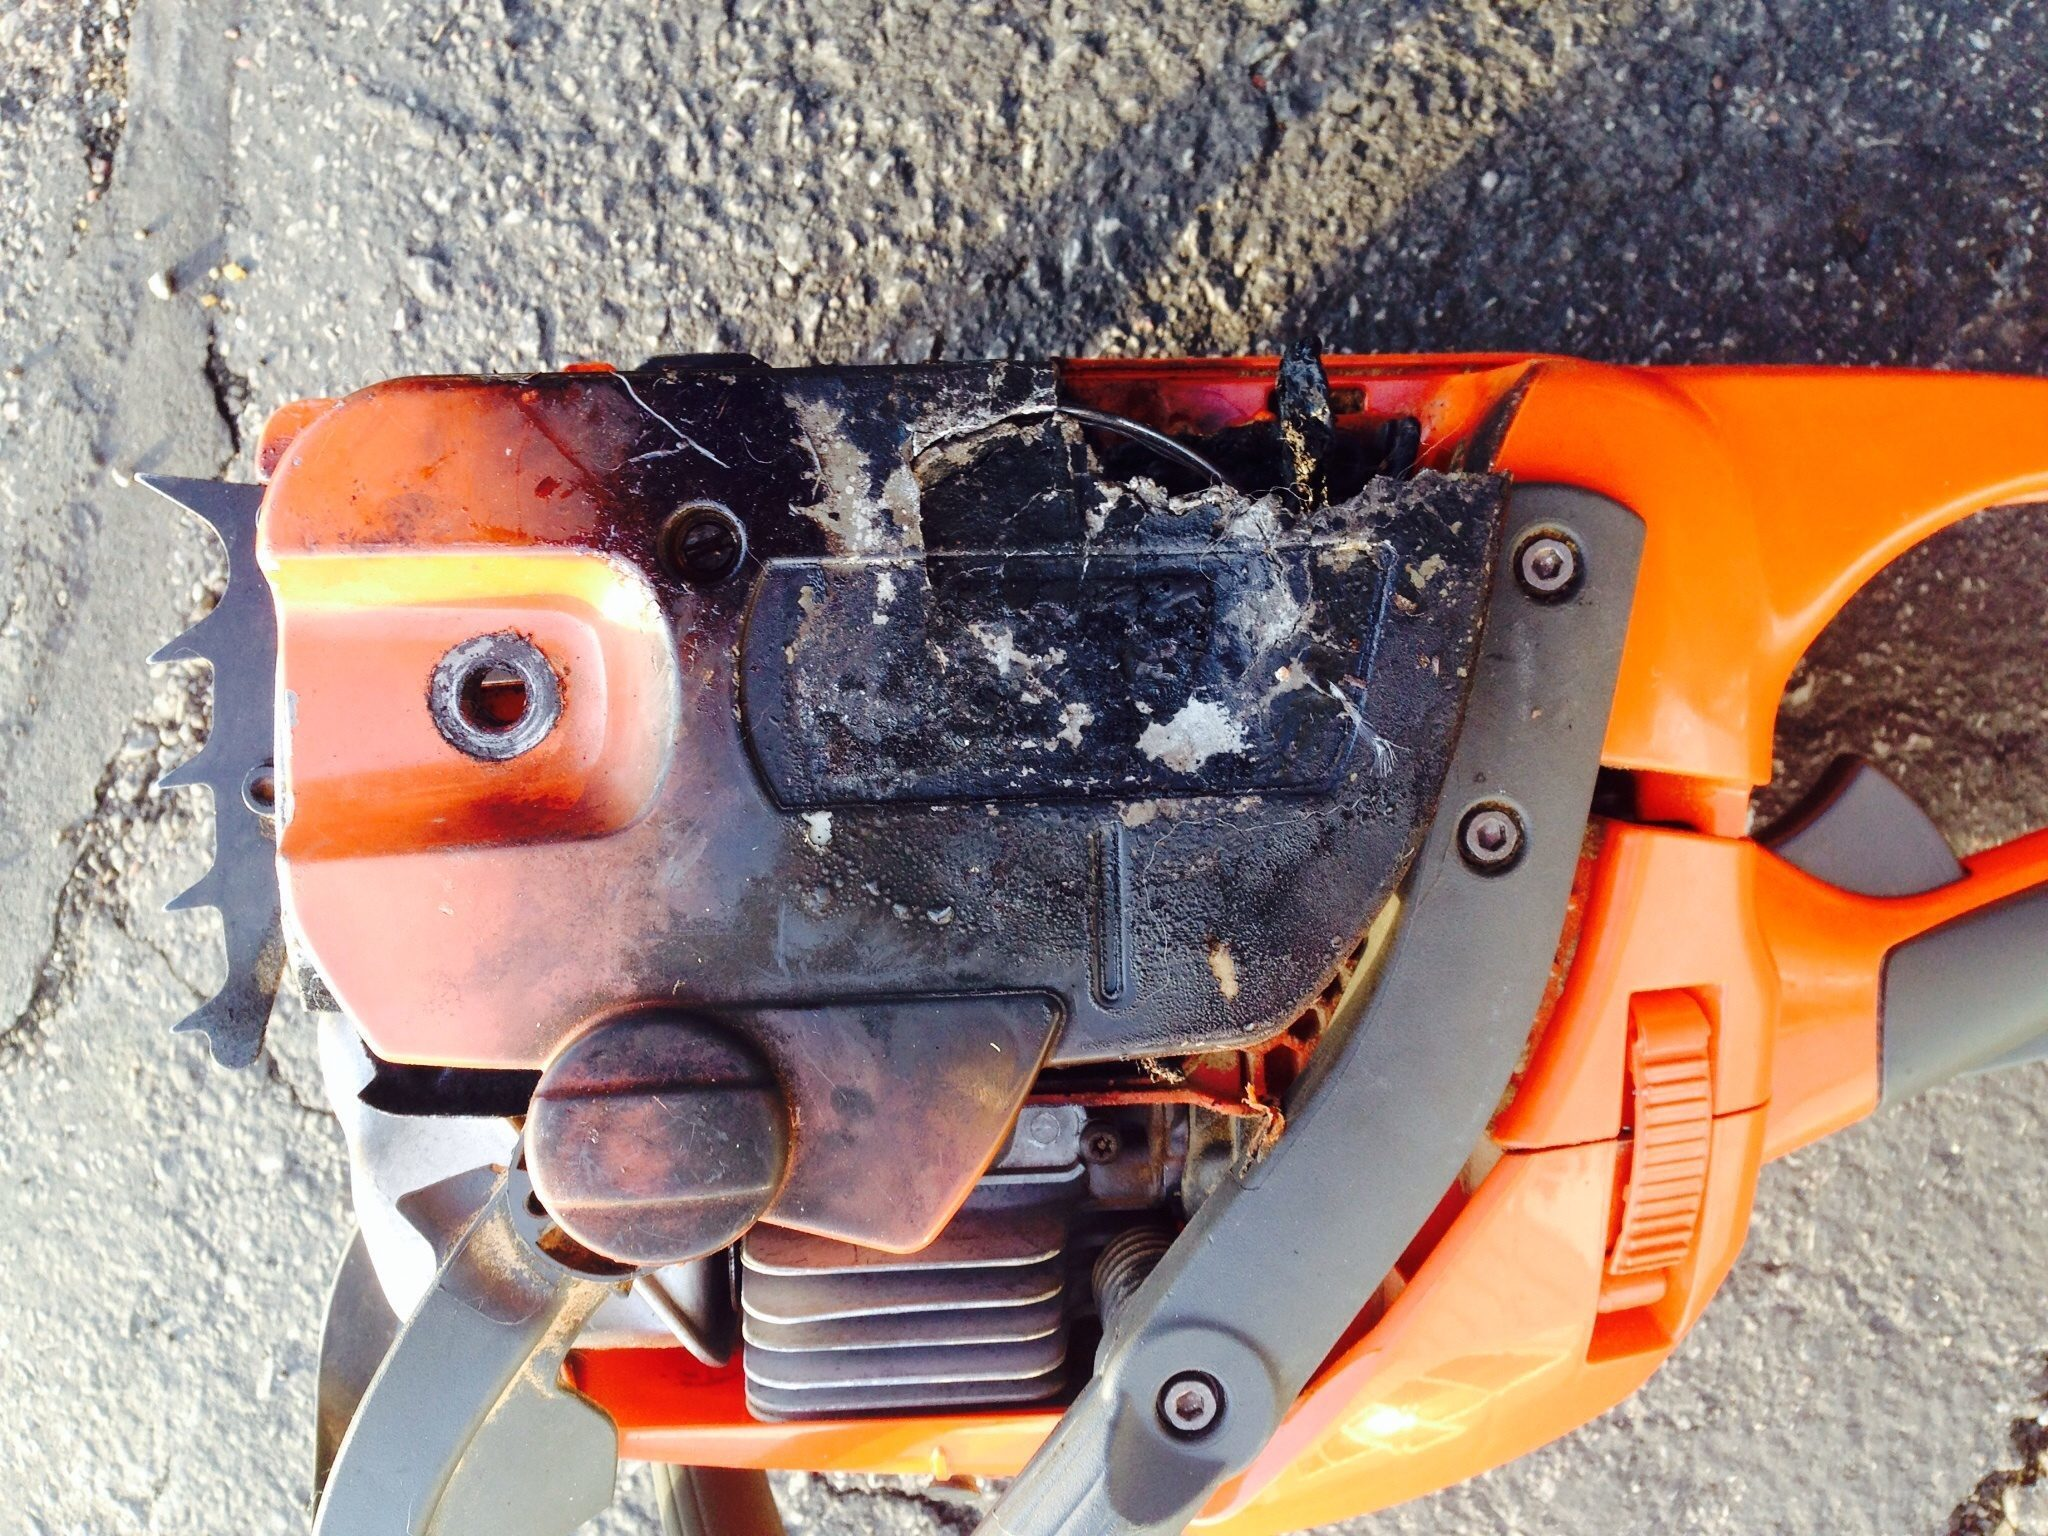 huskee lt4200 riding lawn mower wiring diagram huskee